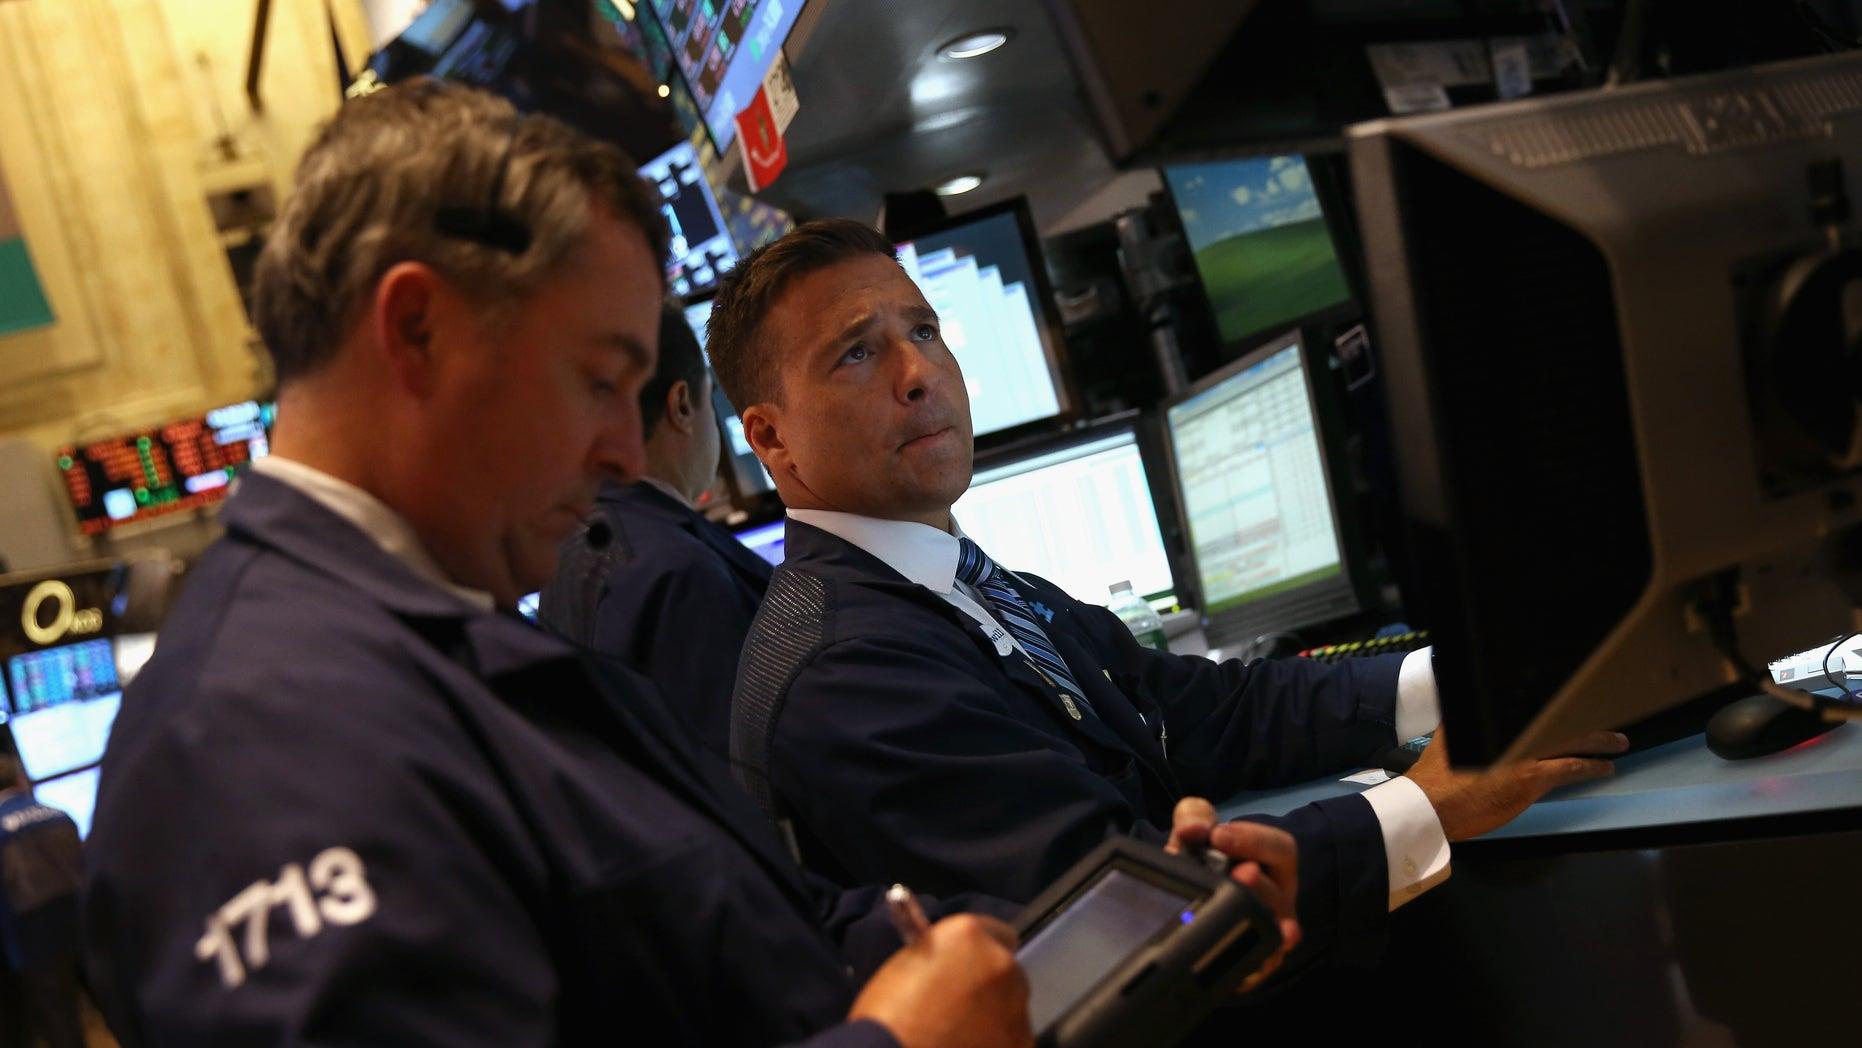 Traders work the floor of the New York Stock Exchange on September 16, 2013 in New York City.